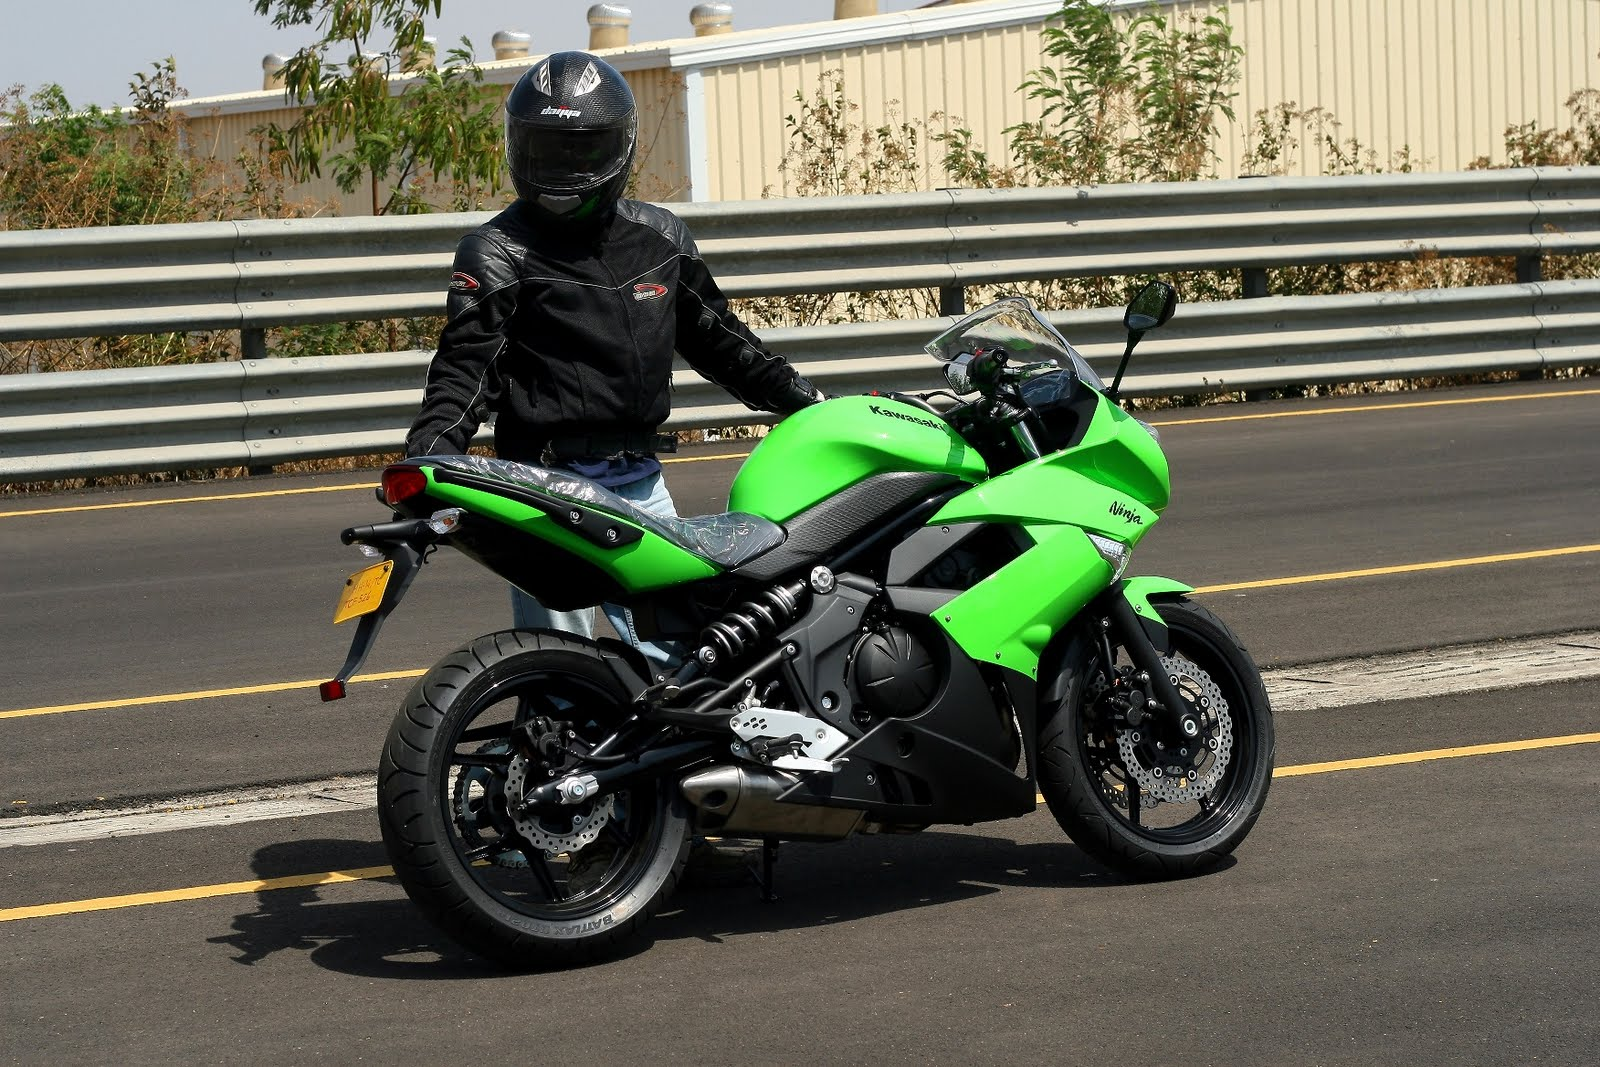 Photos of the 2011 Kawasaki Ninja 650R (India) | Bike Chronicles of ...